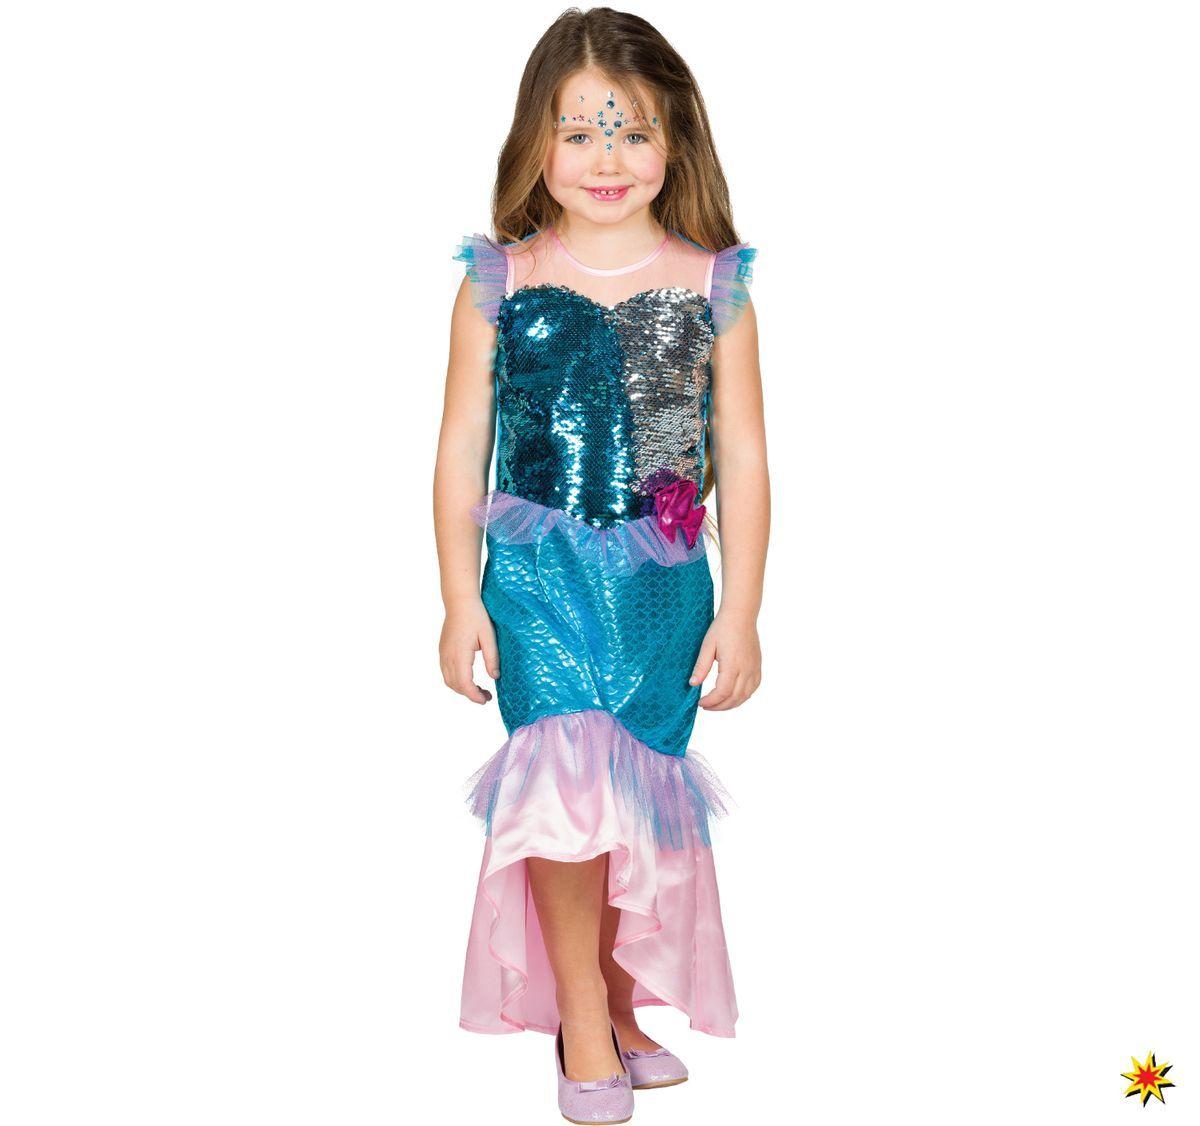 Kinder Kostüm Meerjungfrau Nixe, Kleid mit Wendepailletten ...